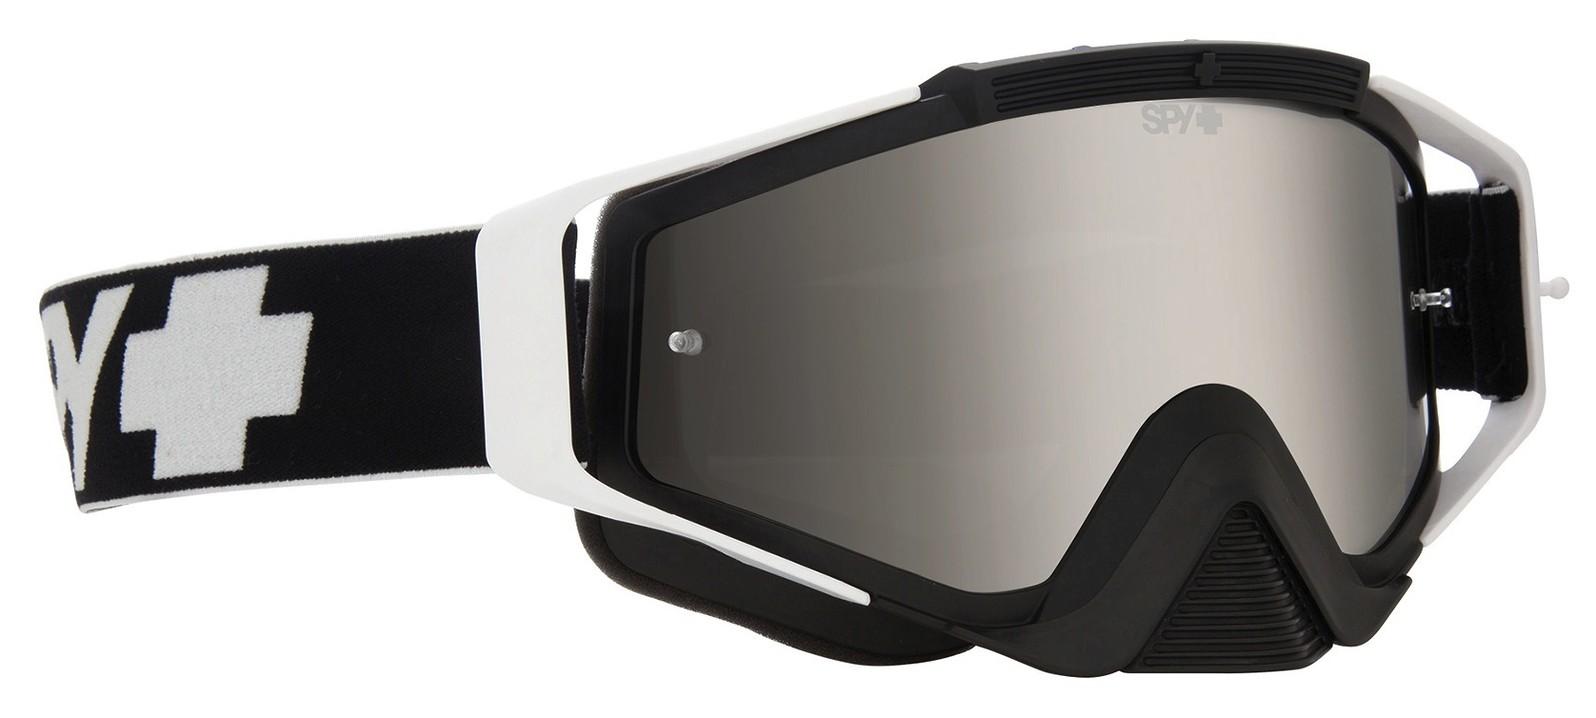 e79709e8ca Spy Optic Omen MX Goggles - Reviews